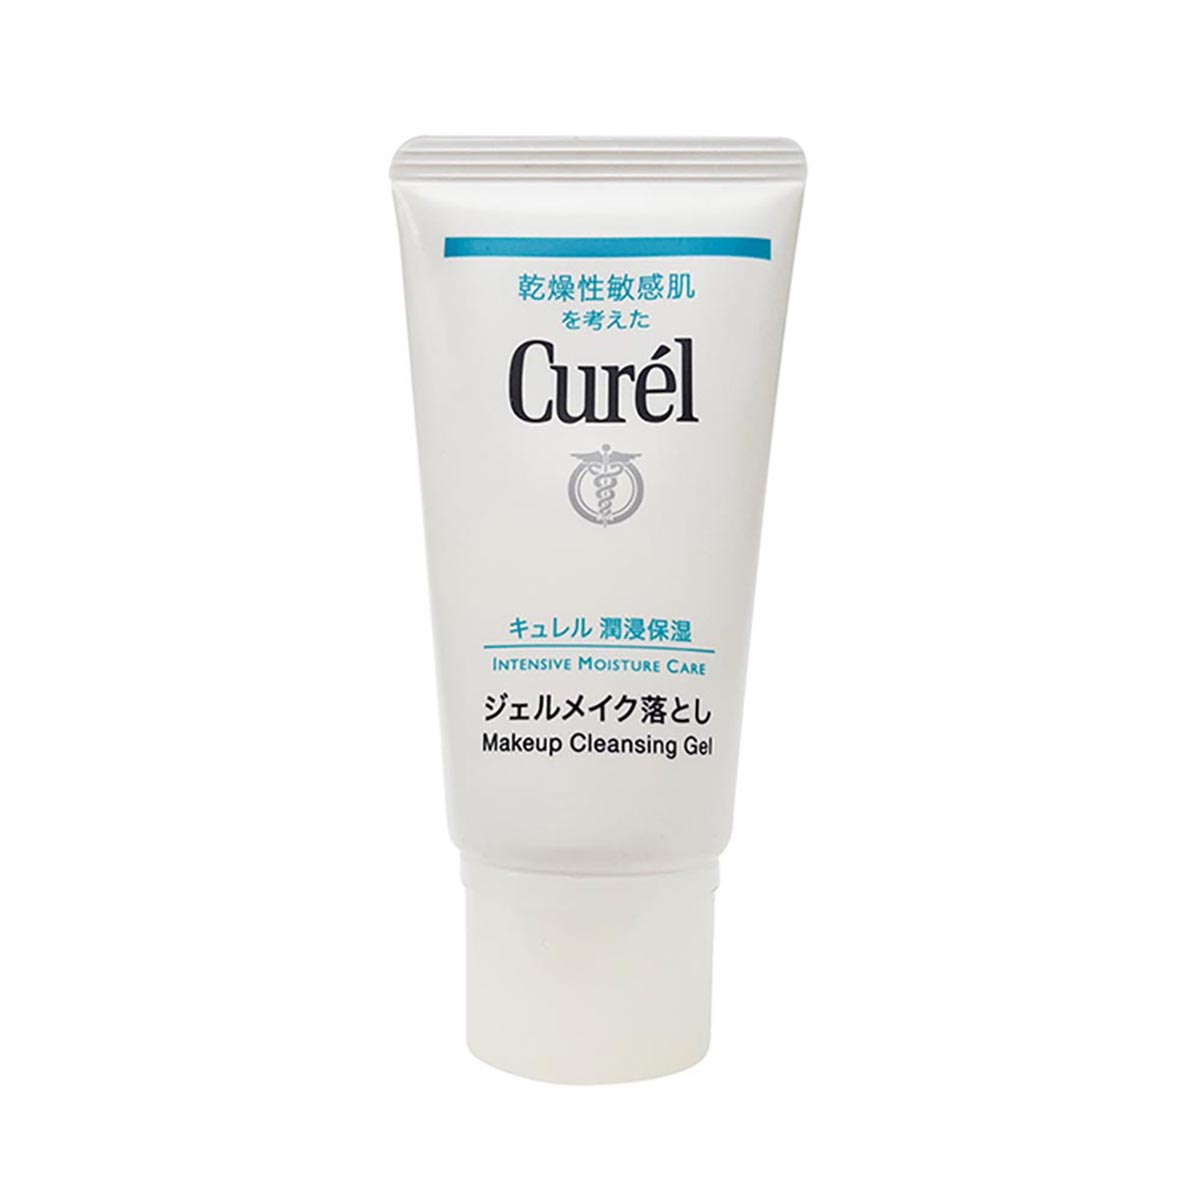 Curel珂潤潤浸保濕深層卸粧凝露30g 【康是美】